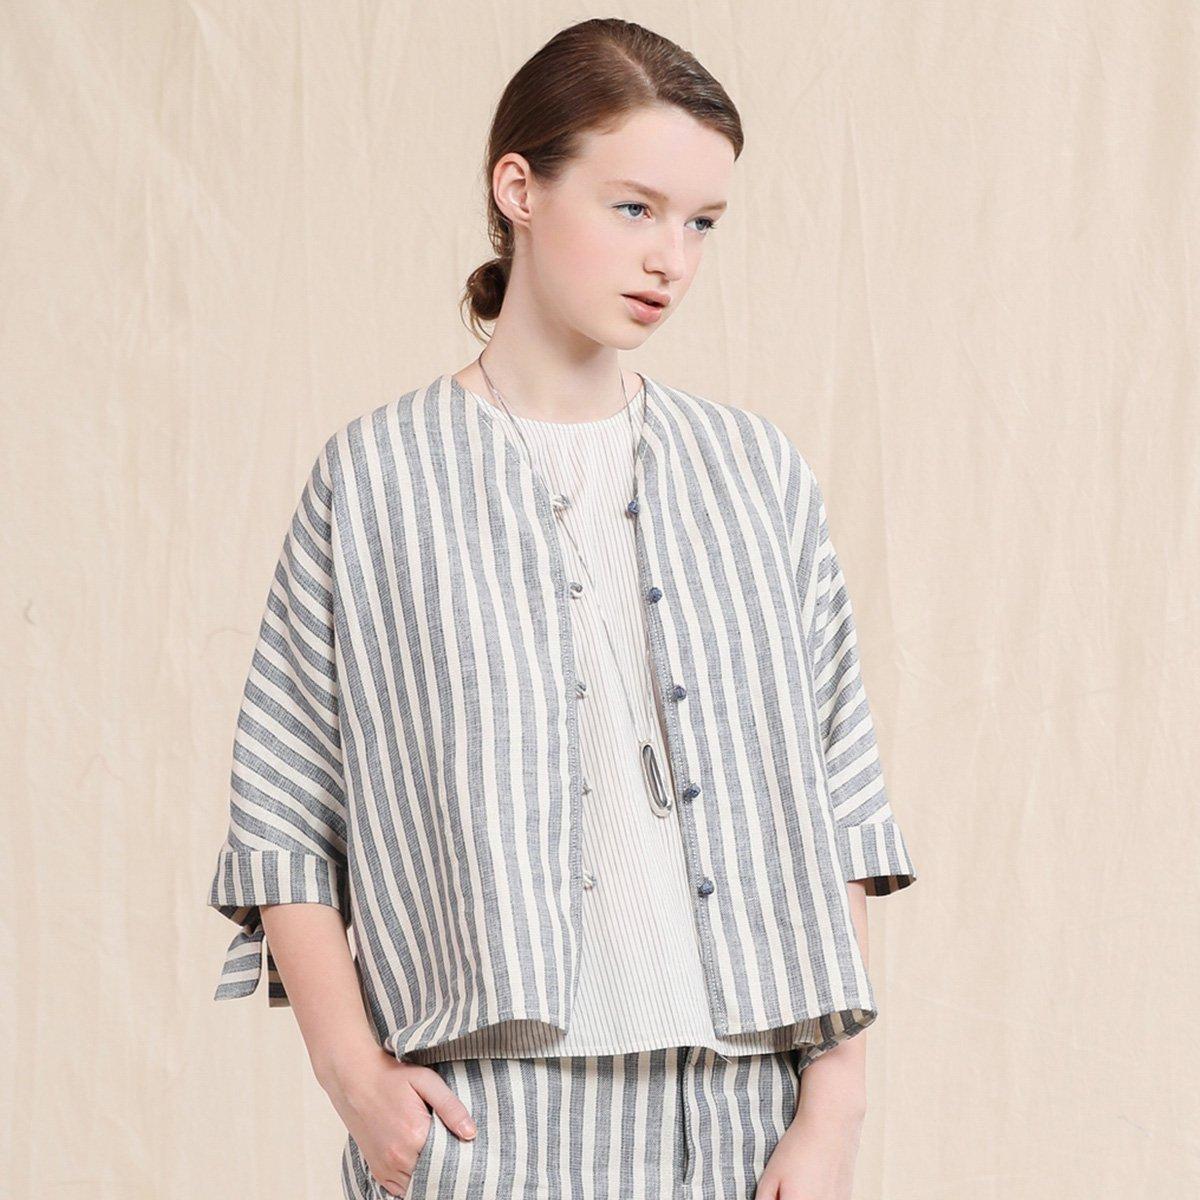 EINPURE TEA/茶愫 亚麻混纺色织条纹箱型外套前短后长2017商场同款TH1101921616